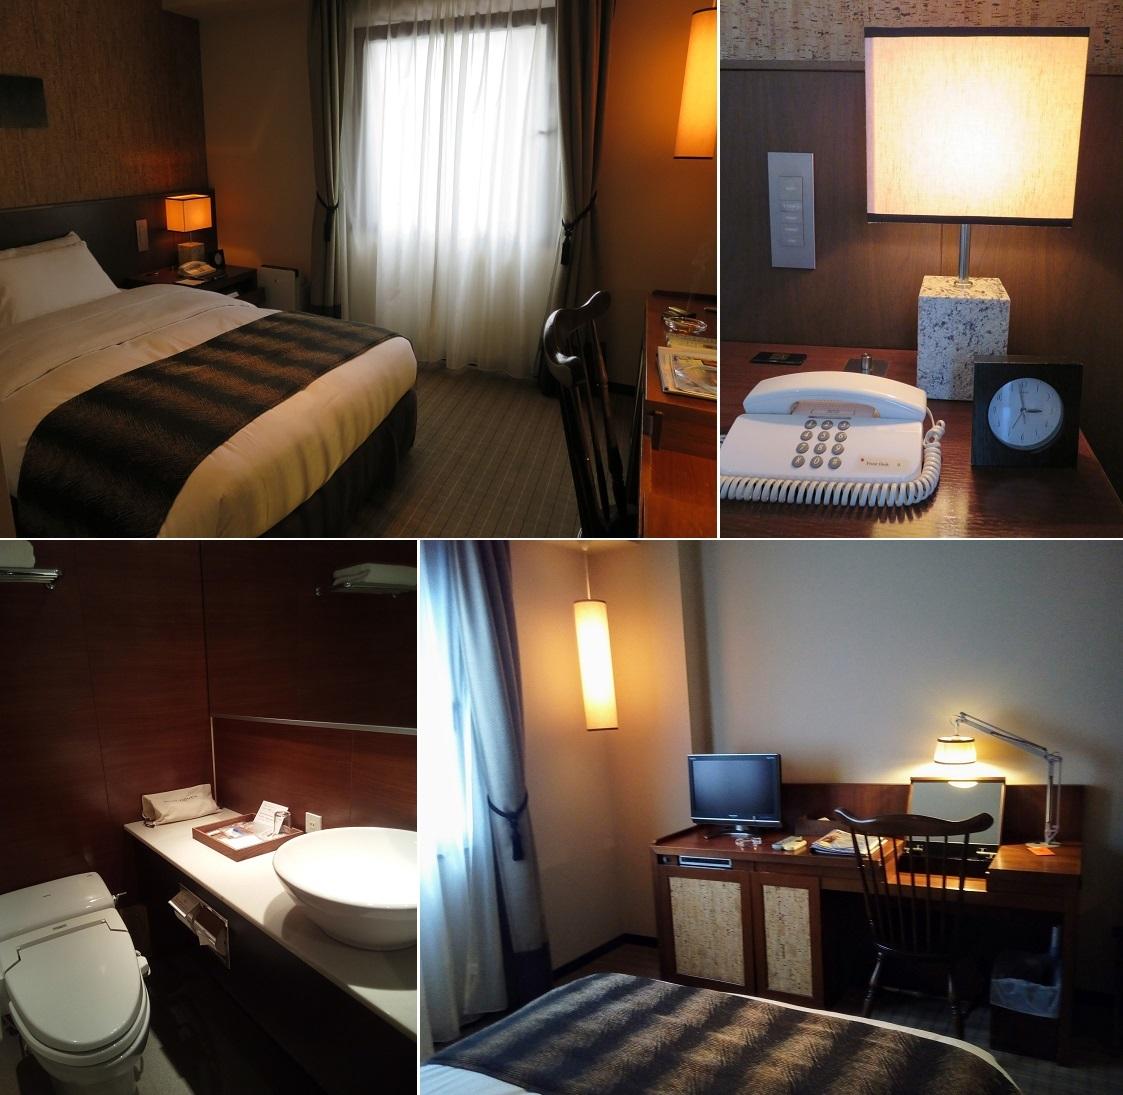 【松本小旅行】④ 松本 丸の内ホテル_a0057402_03383499.jpg